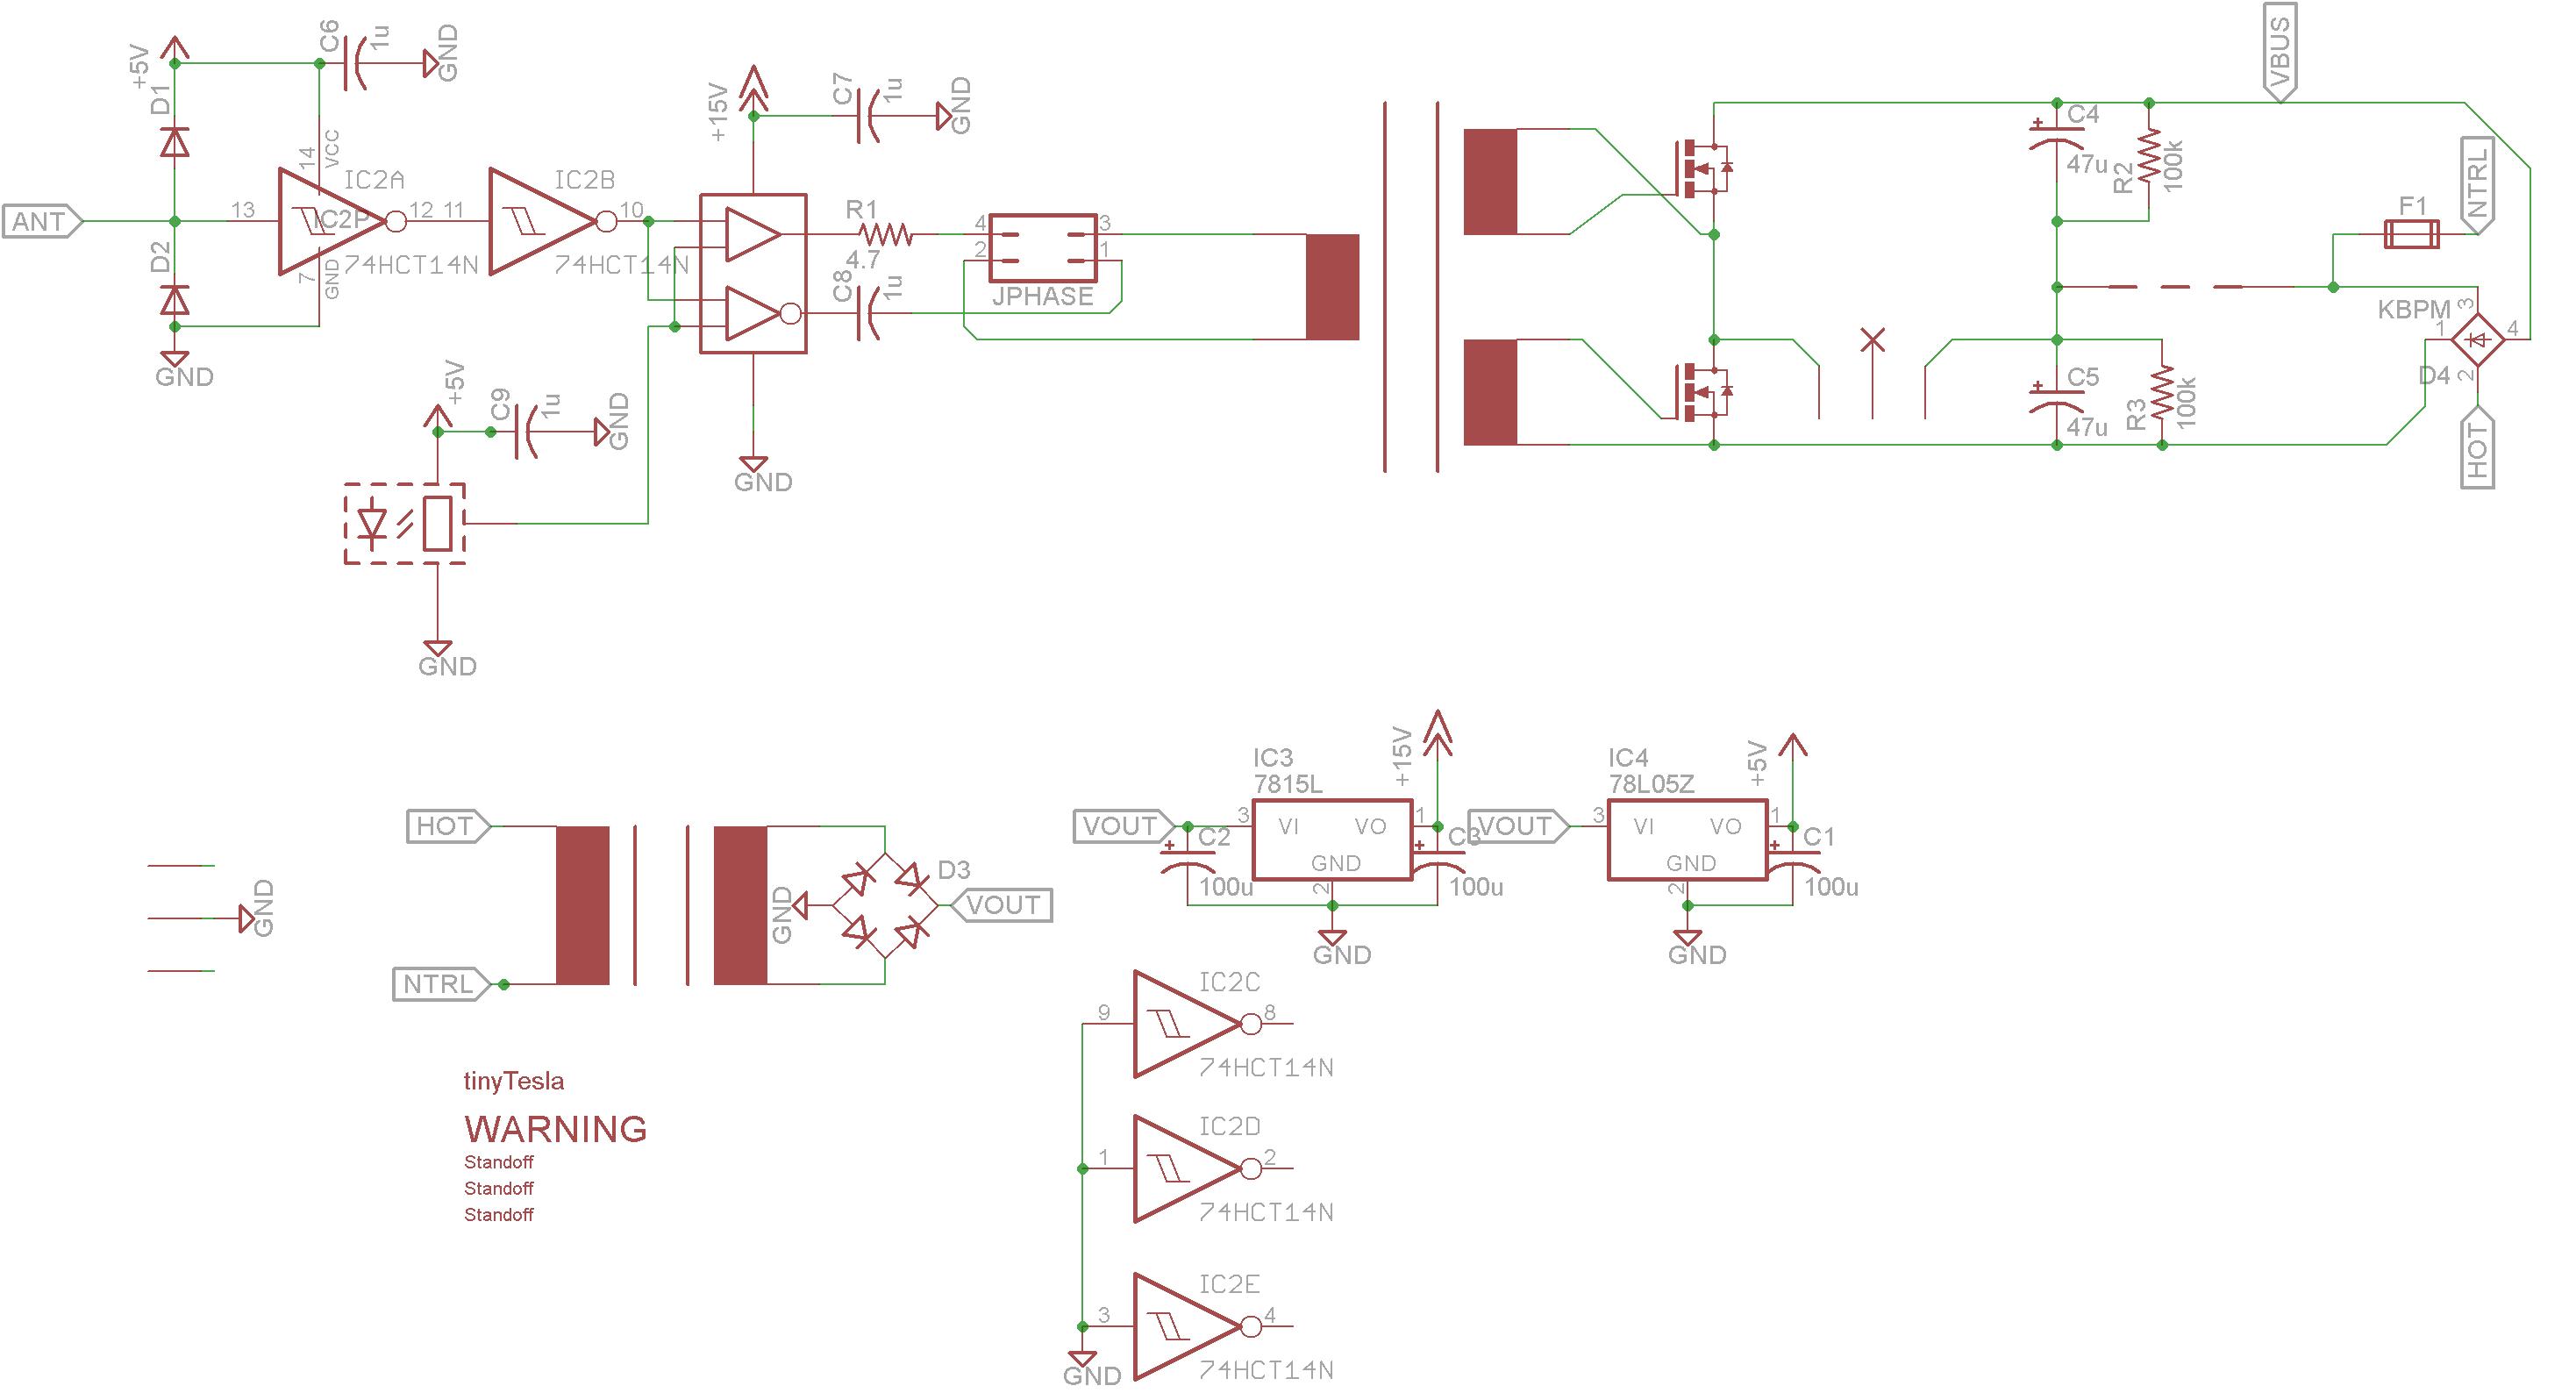 Downloads Quiz Circuit Diagrams Schematics Electronic Projects Tinytesla Schematic